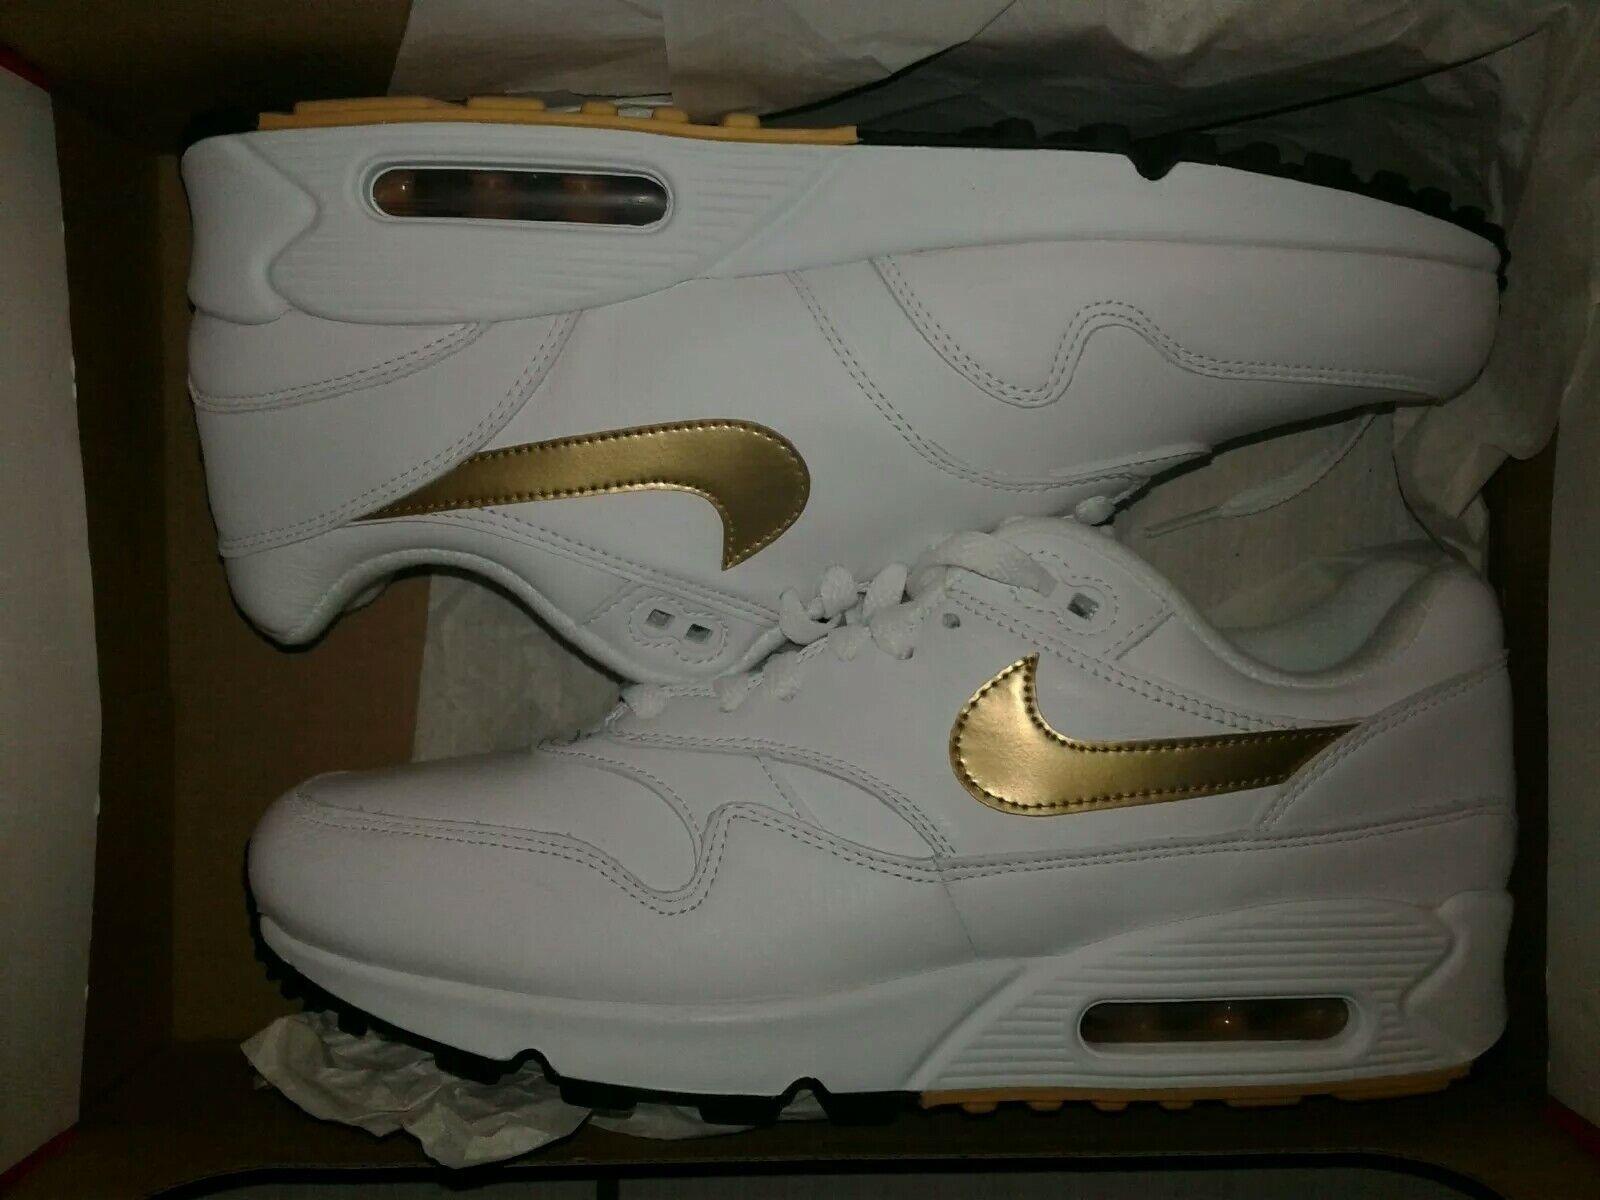 Air Max 90 1 White Metallic gold-Black AJ7695-102 Men's Size 9